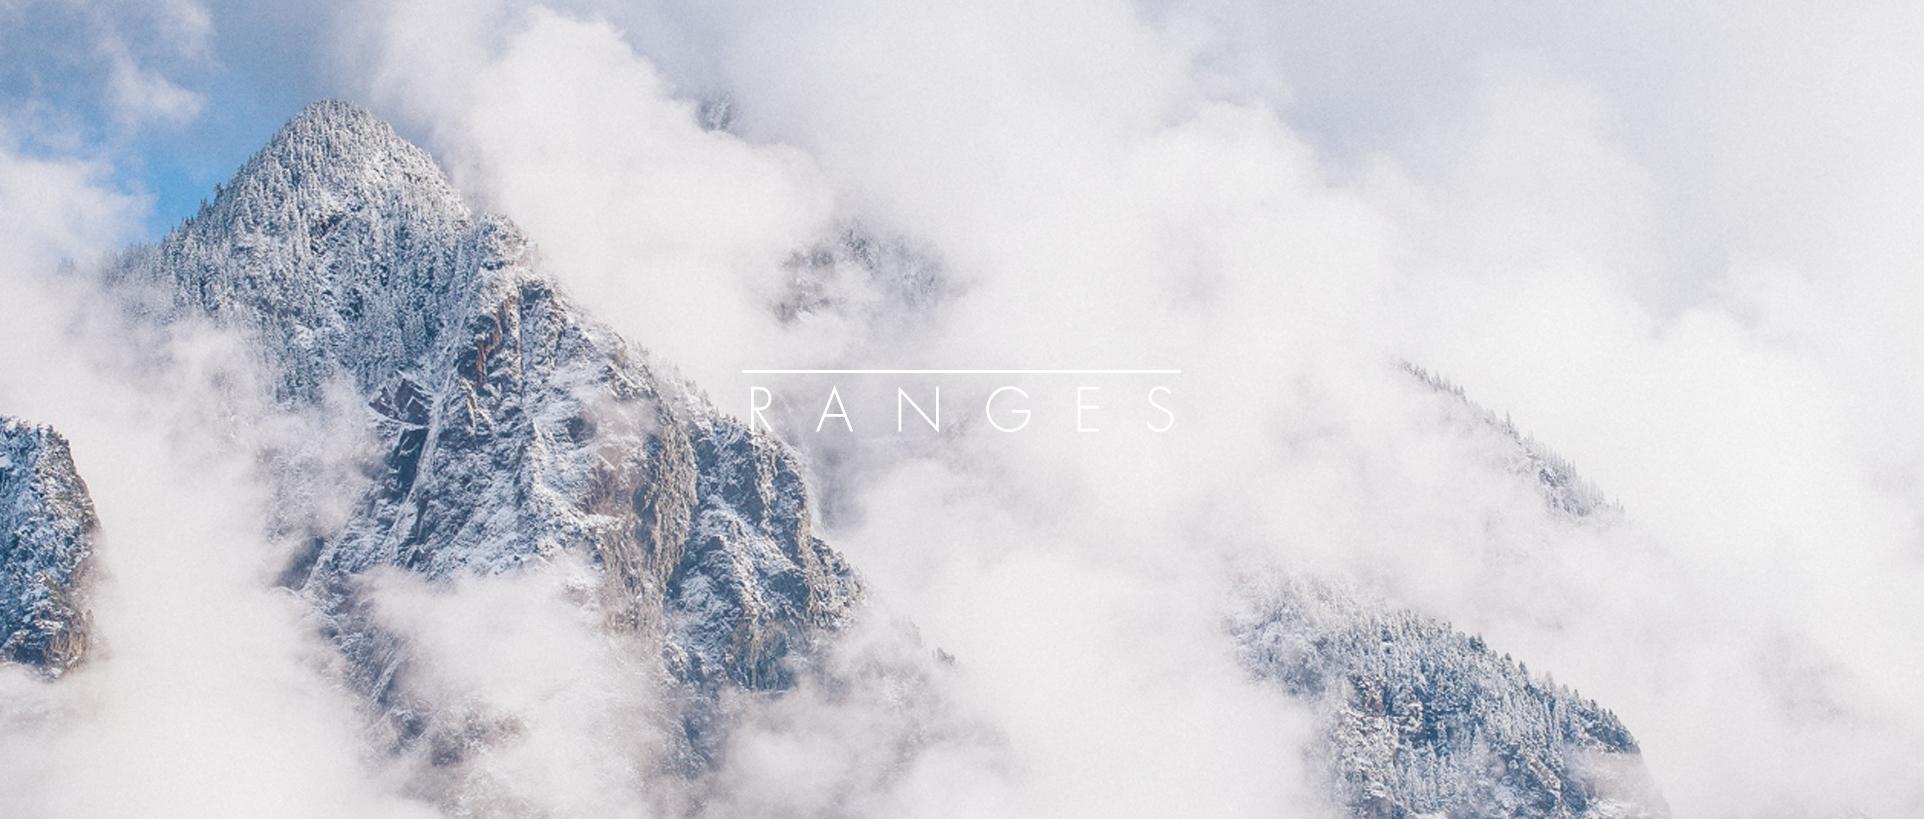 RangesHeader